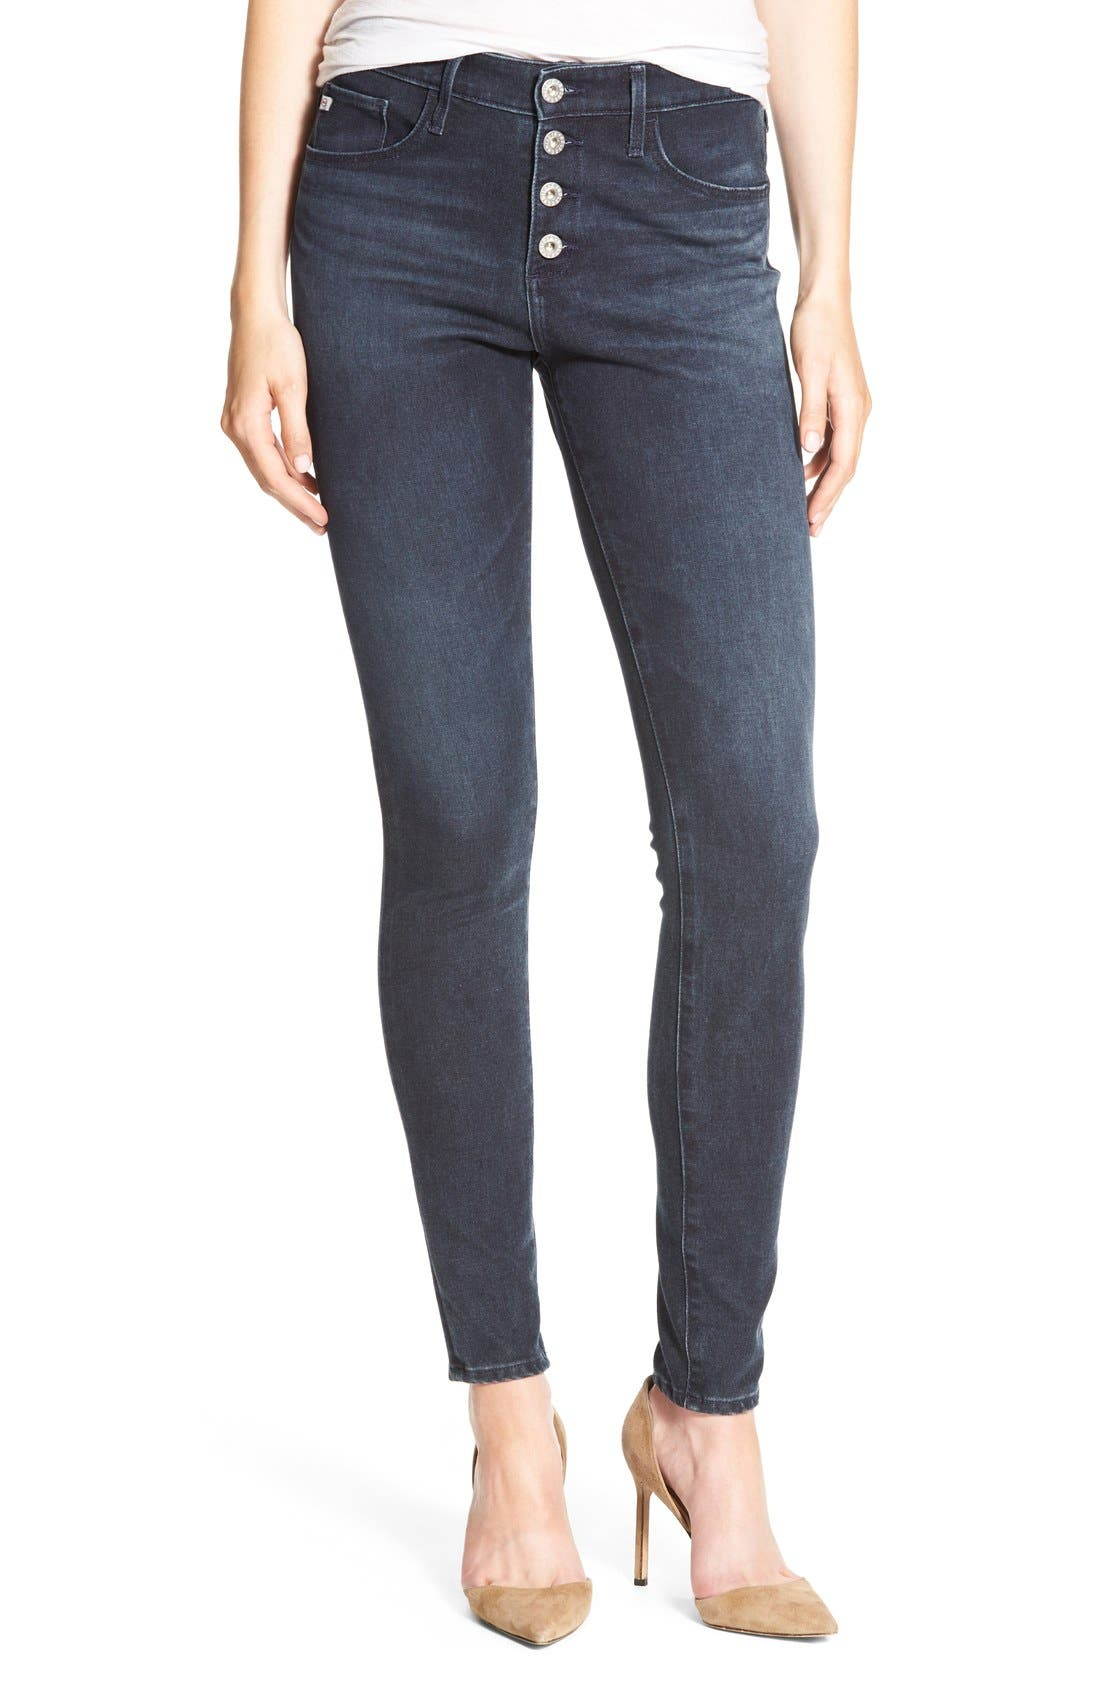 Citizens of Humanity Liya High Waist Slim Boyfriend Jeans,                         Main,                         color, 406